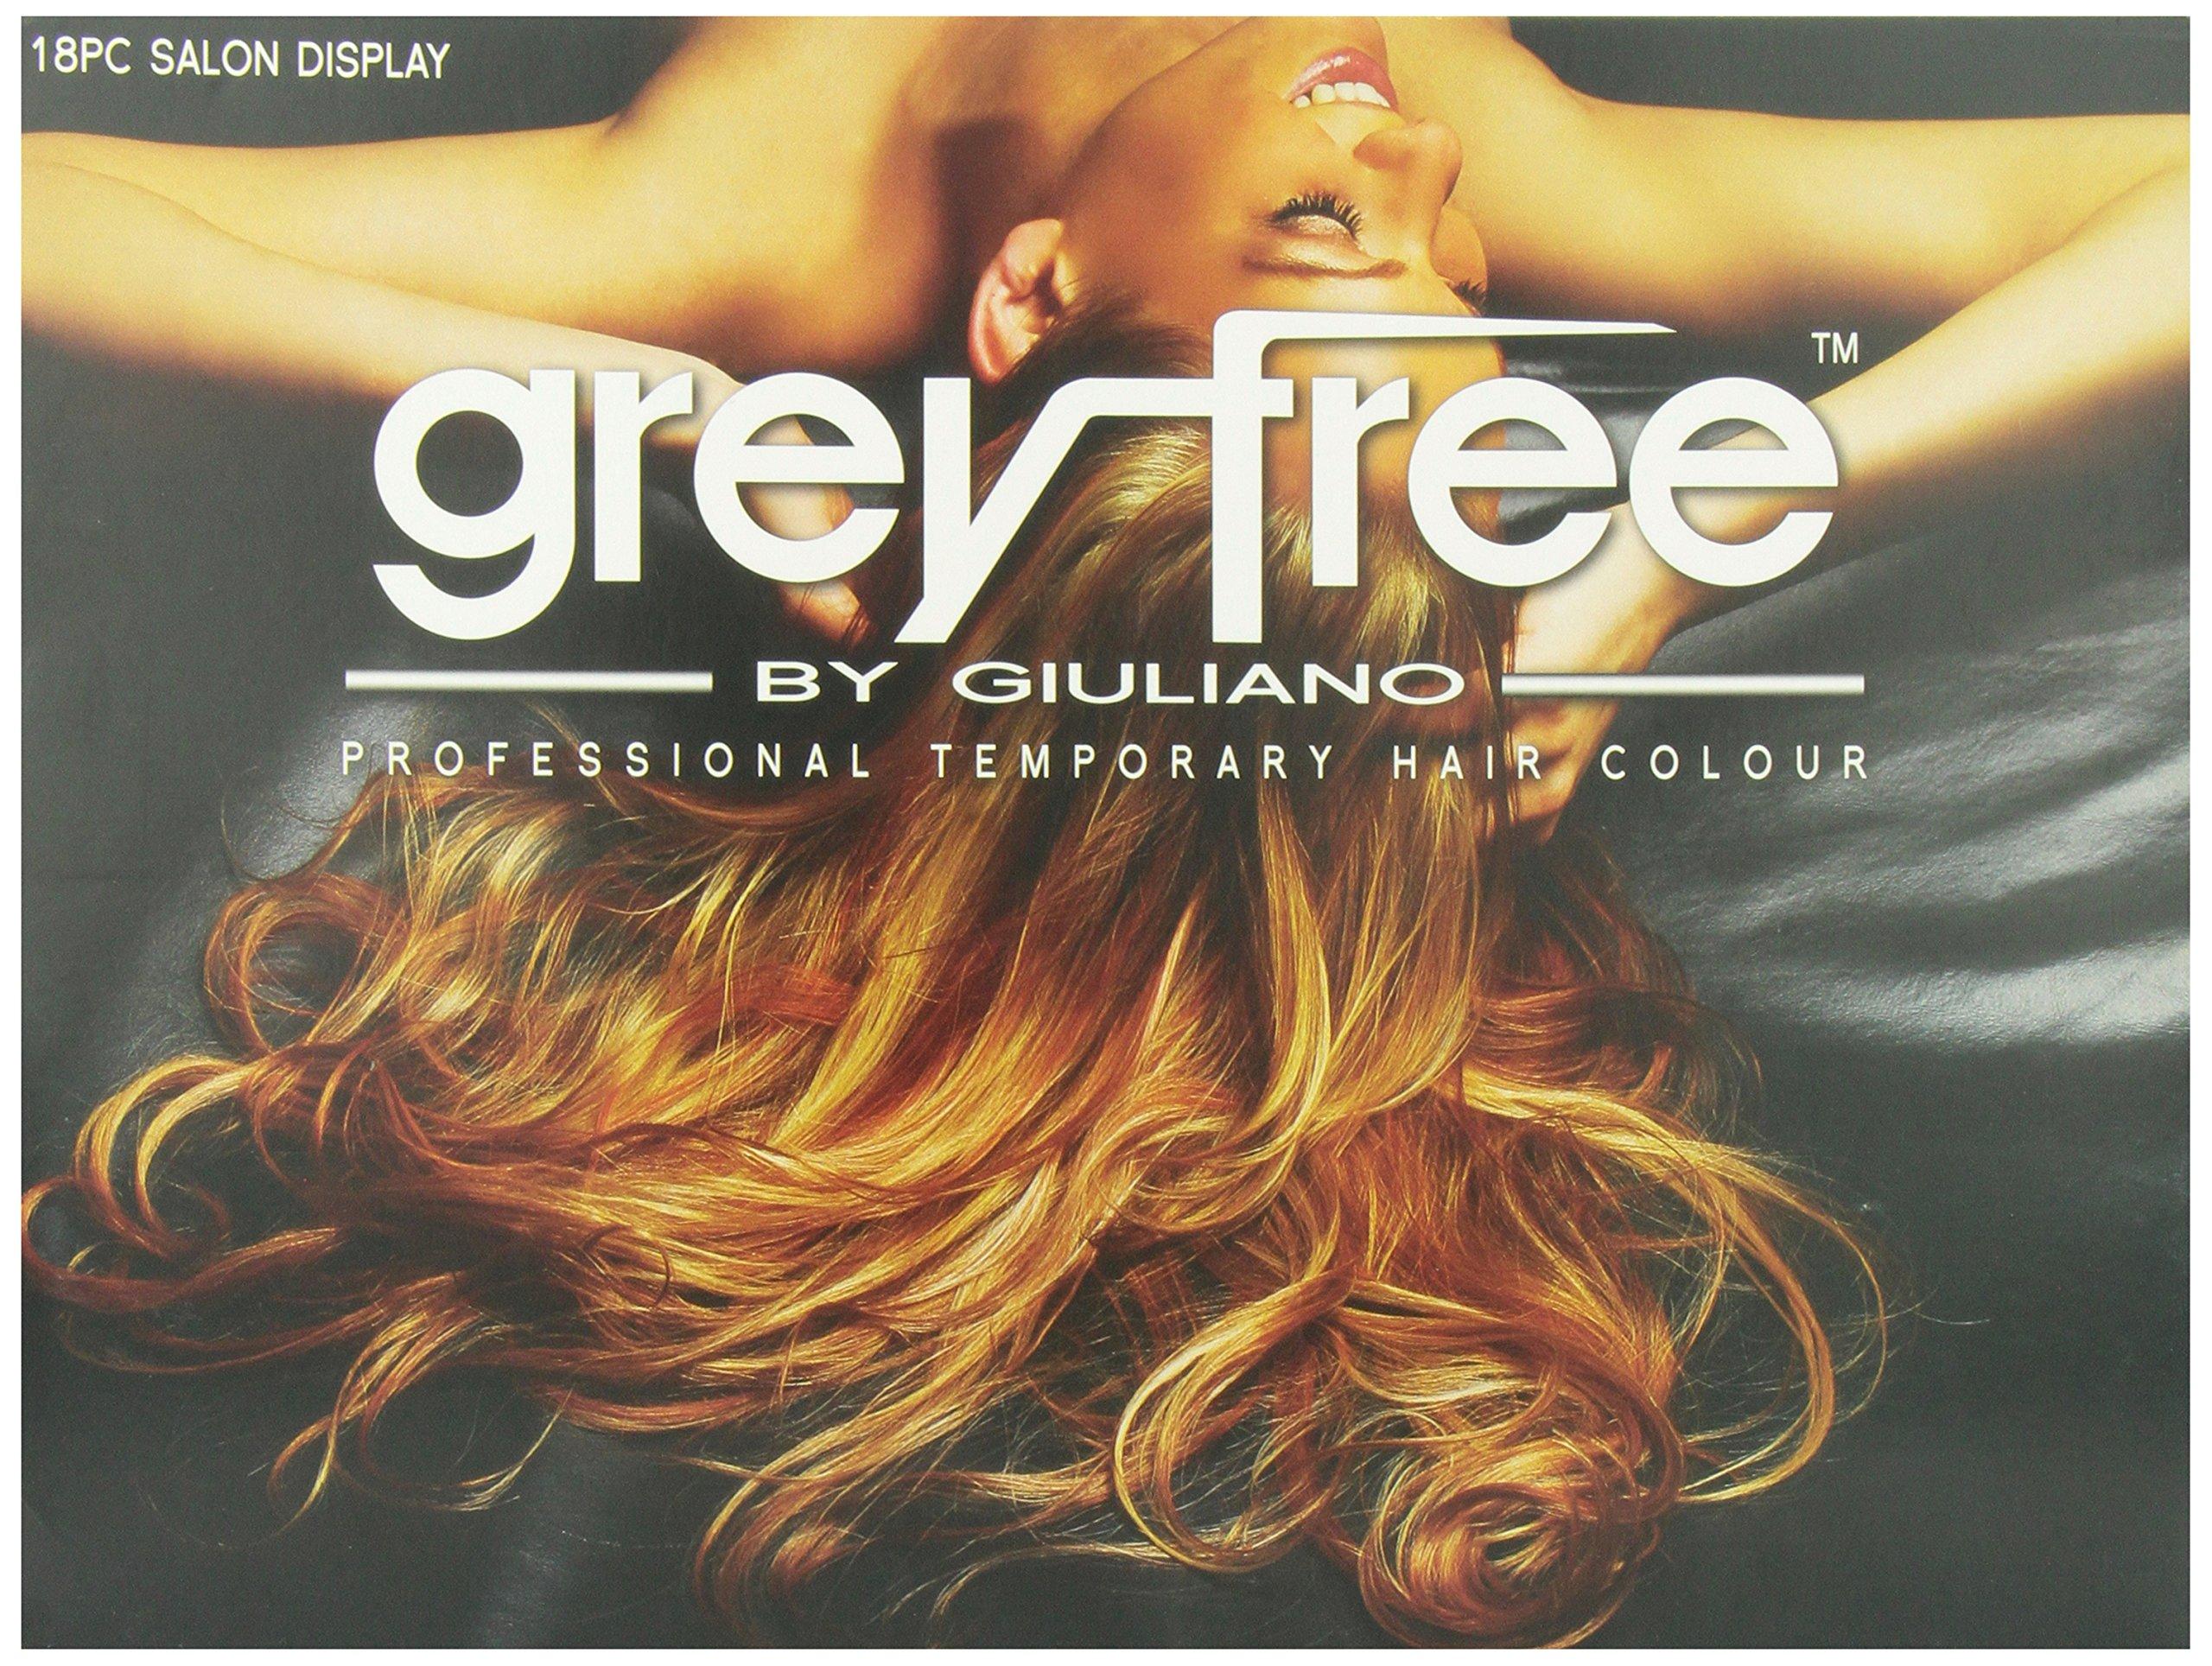 Greyfree Professional Temprorary Hair Color 18 Pieces Display by Greyfree (Image #2)